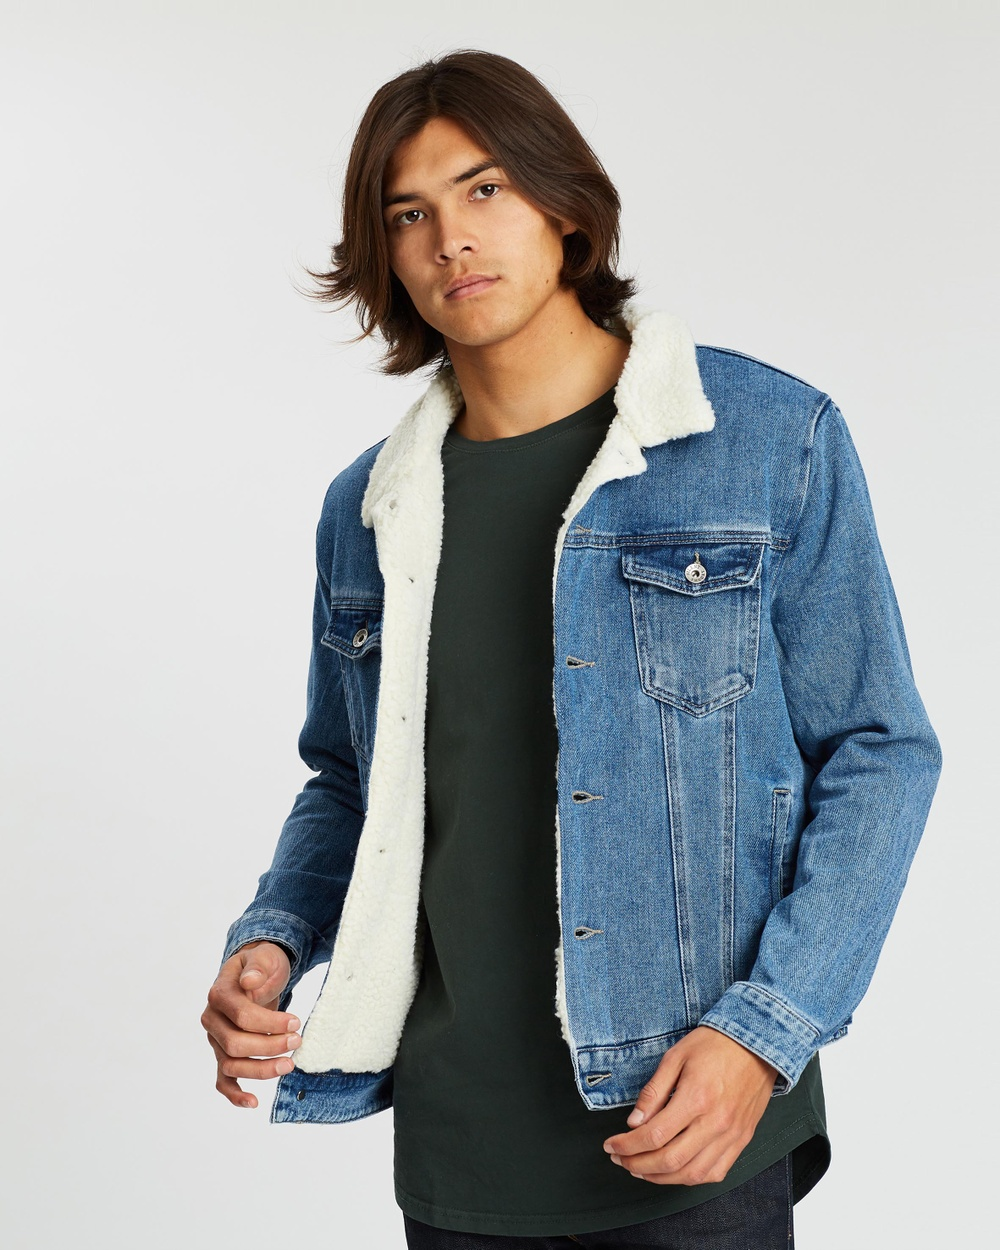 Silent Theory Jefe Sherpa Jacket Denim jacket Vintage Blue Australia